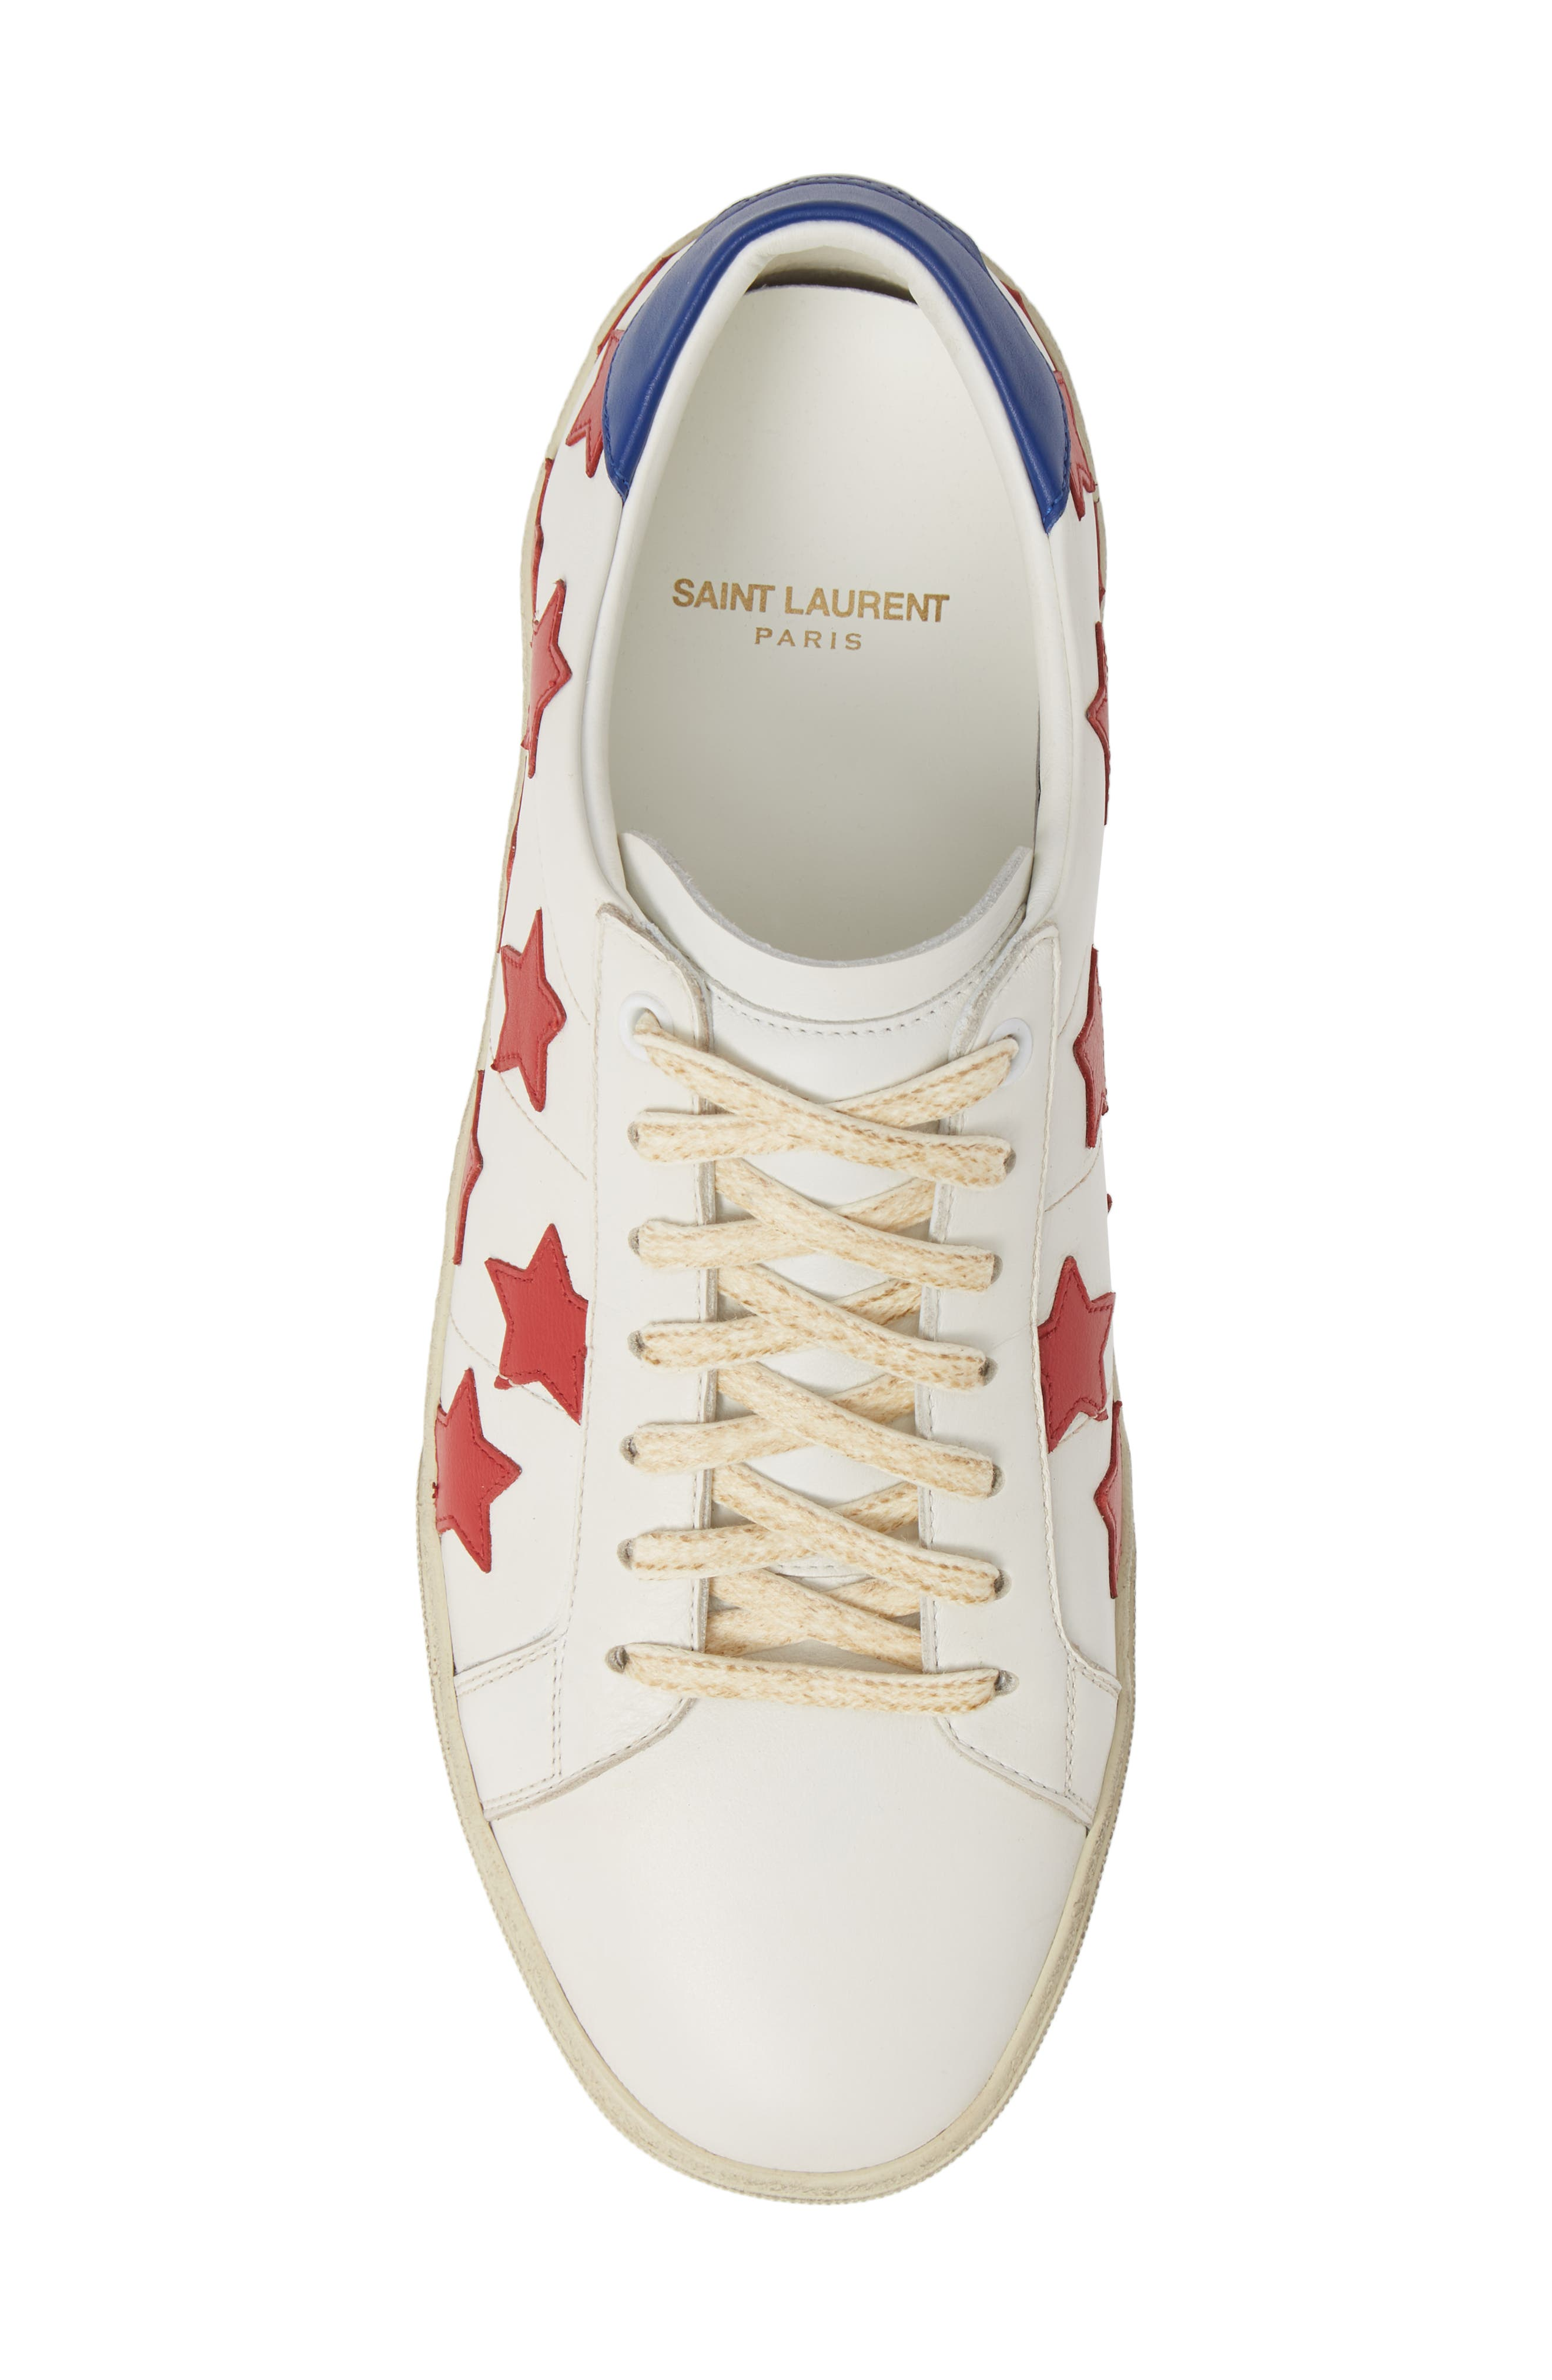 SAINT LAURENT,                             Star Low-Top Sneaker,                             Alternate thumbnail 5, color,                             WHITE/ MULTI